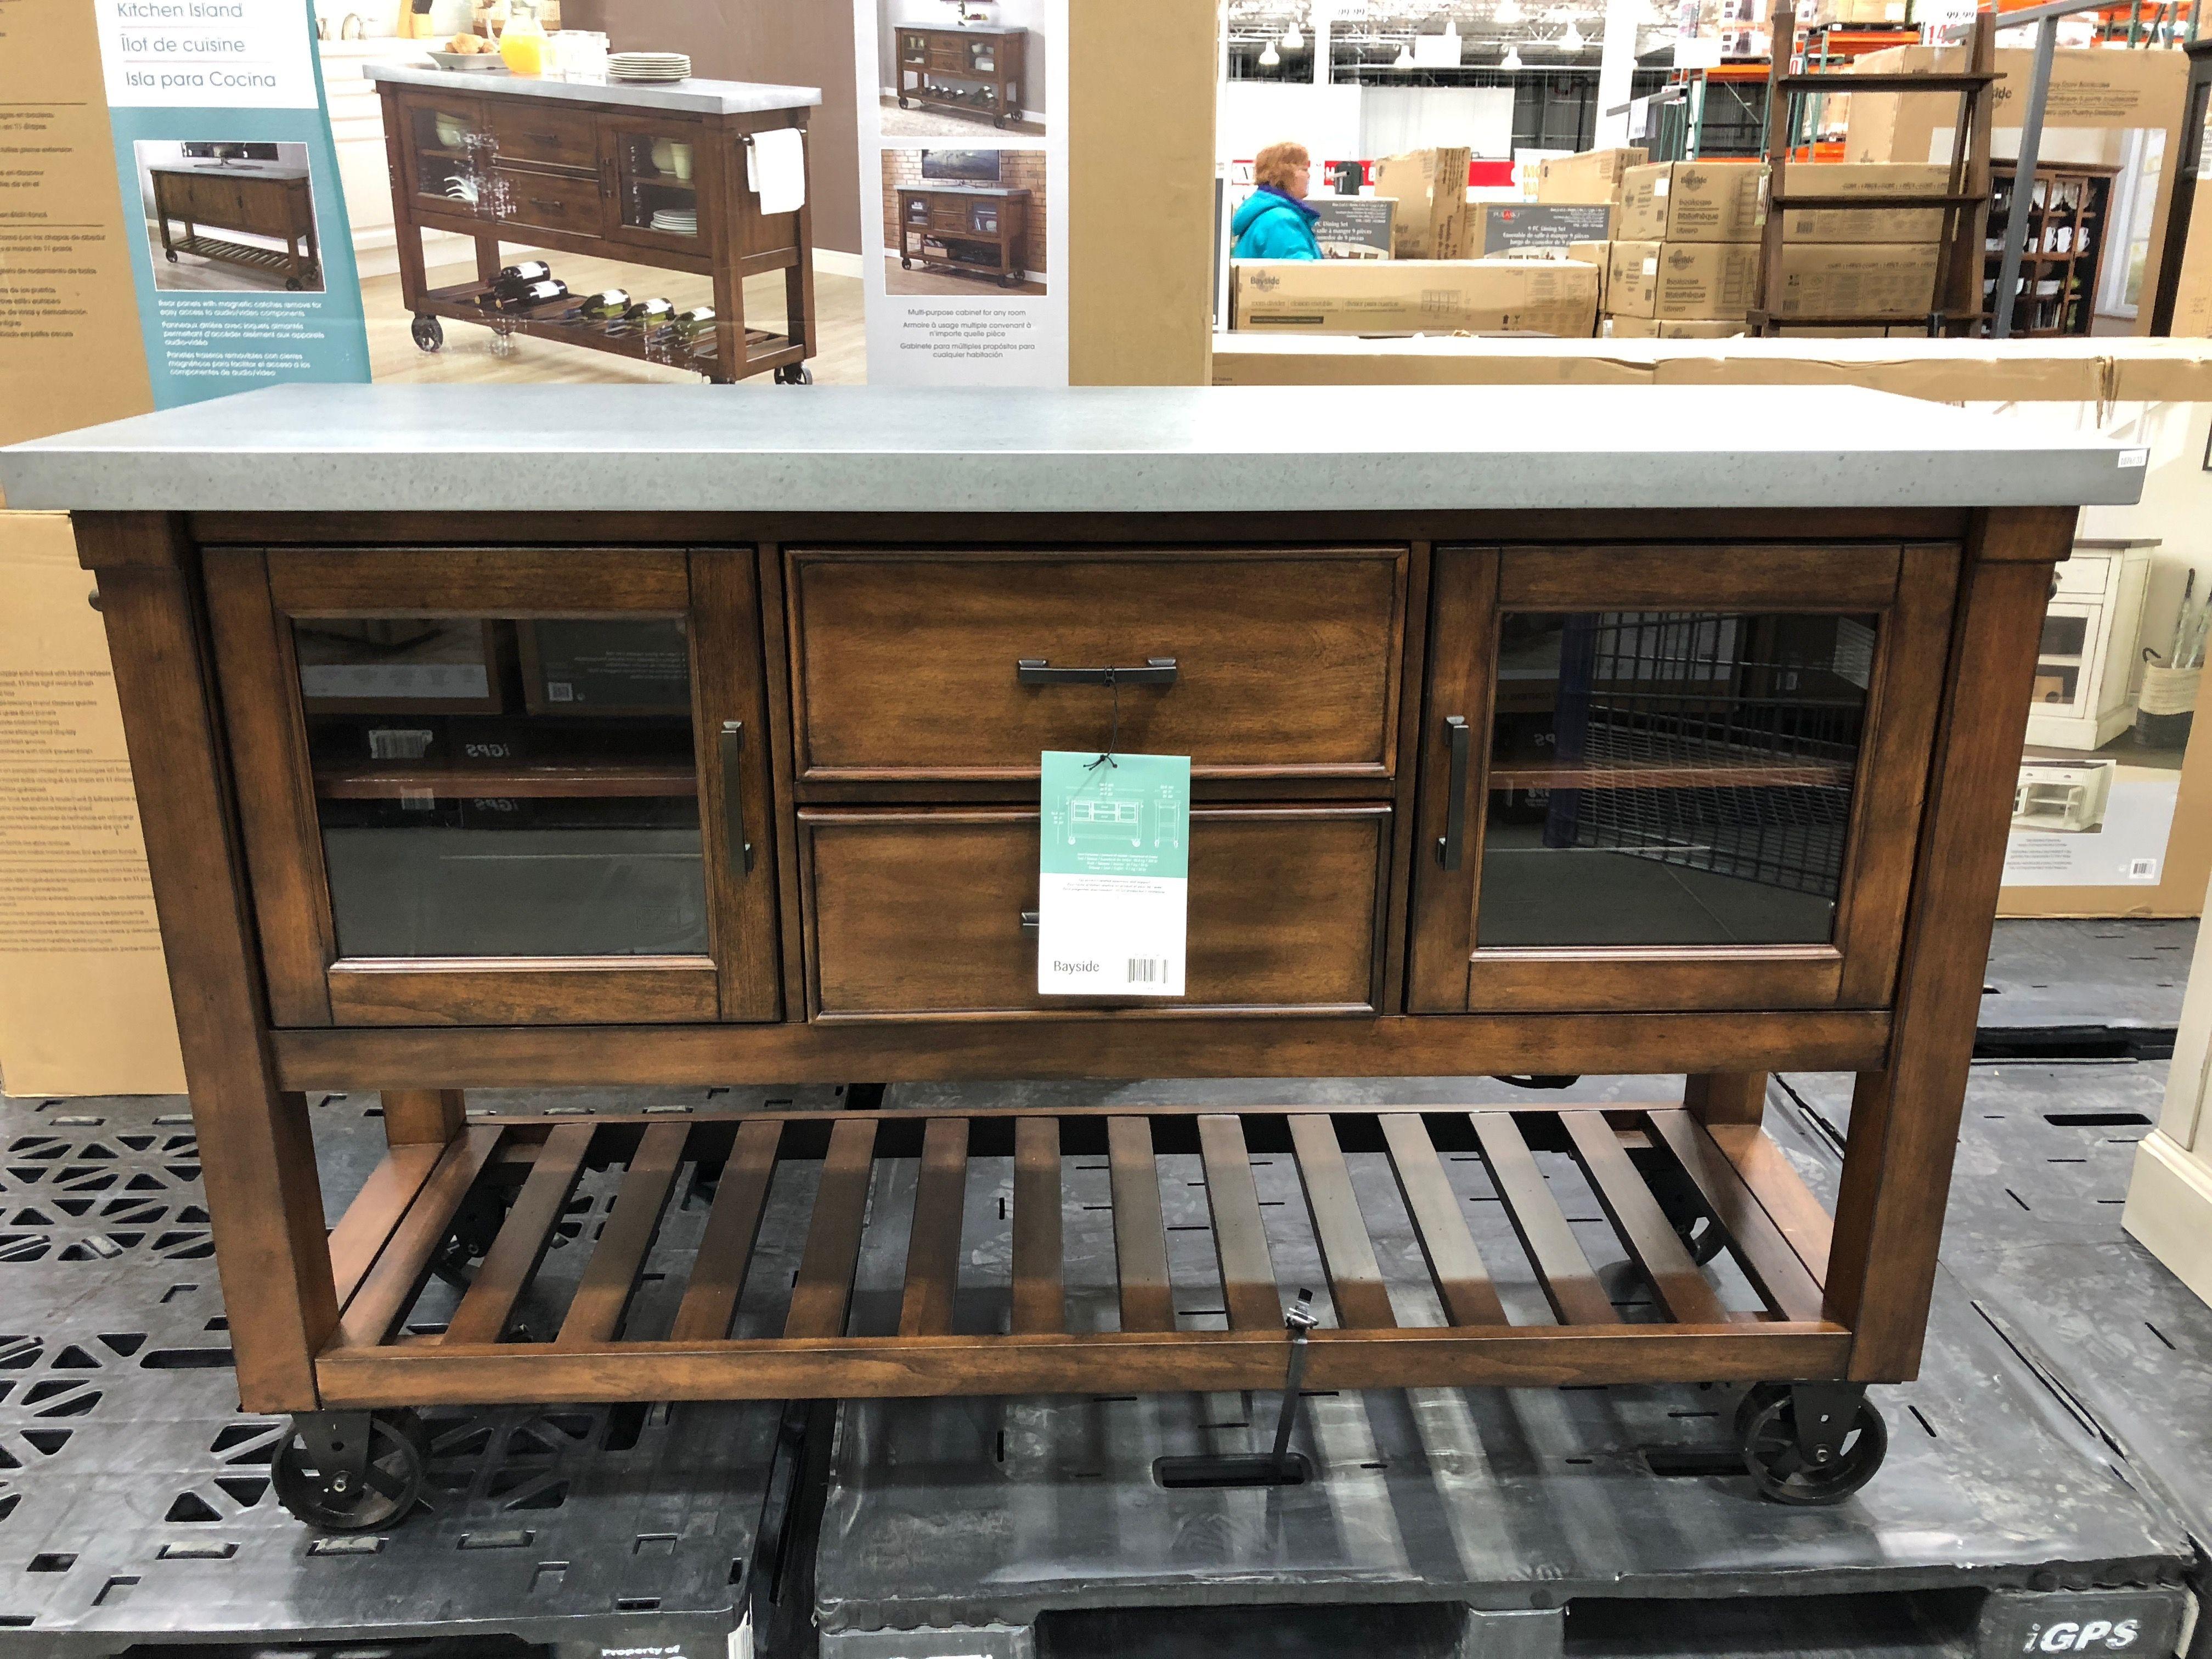 bayside kitchen island console at costco 399 99 61 x20 x38